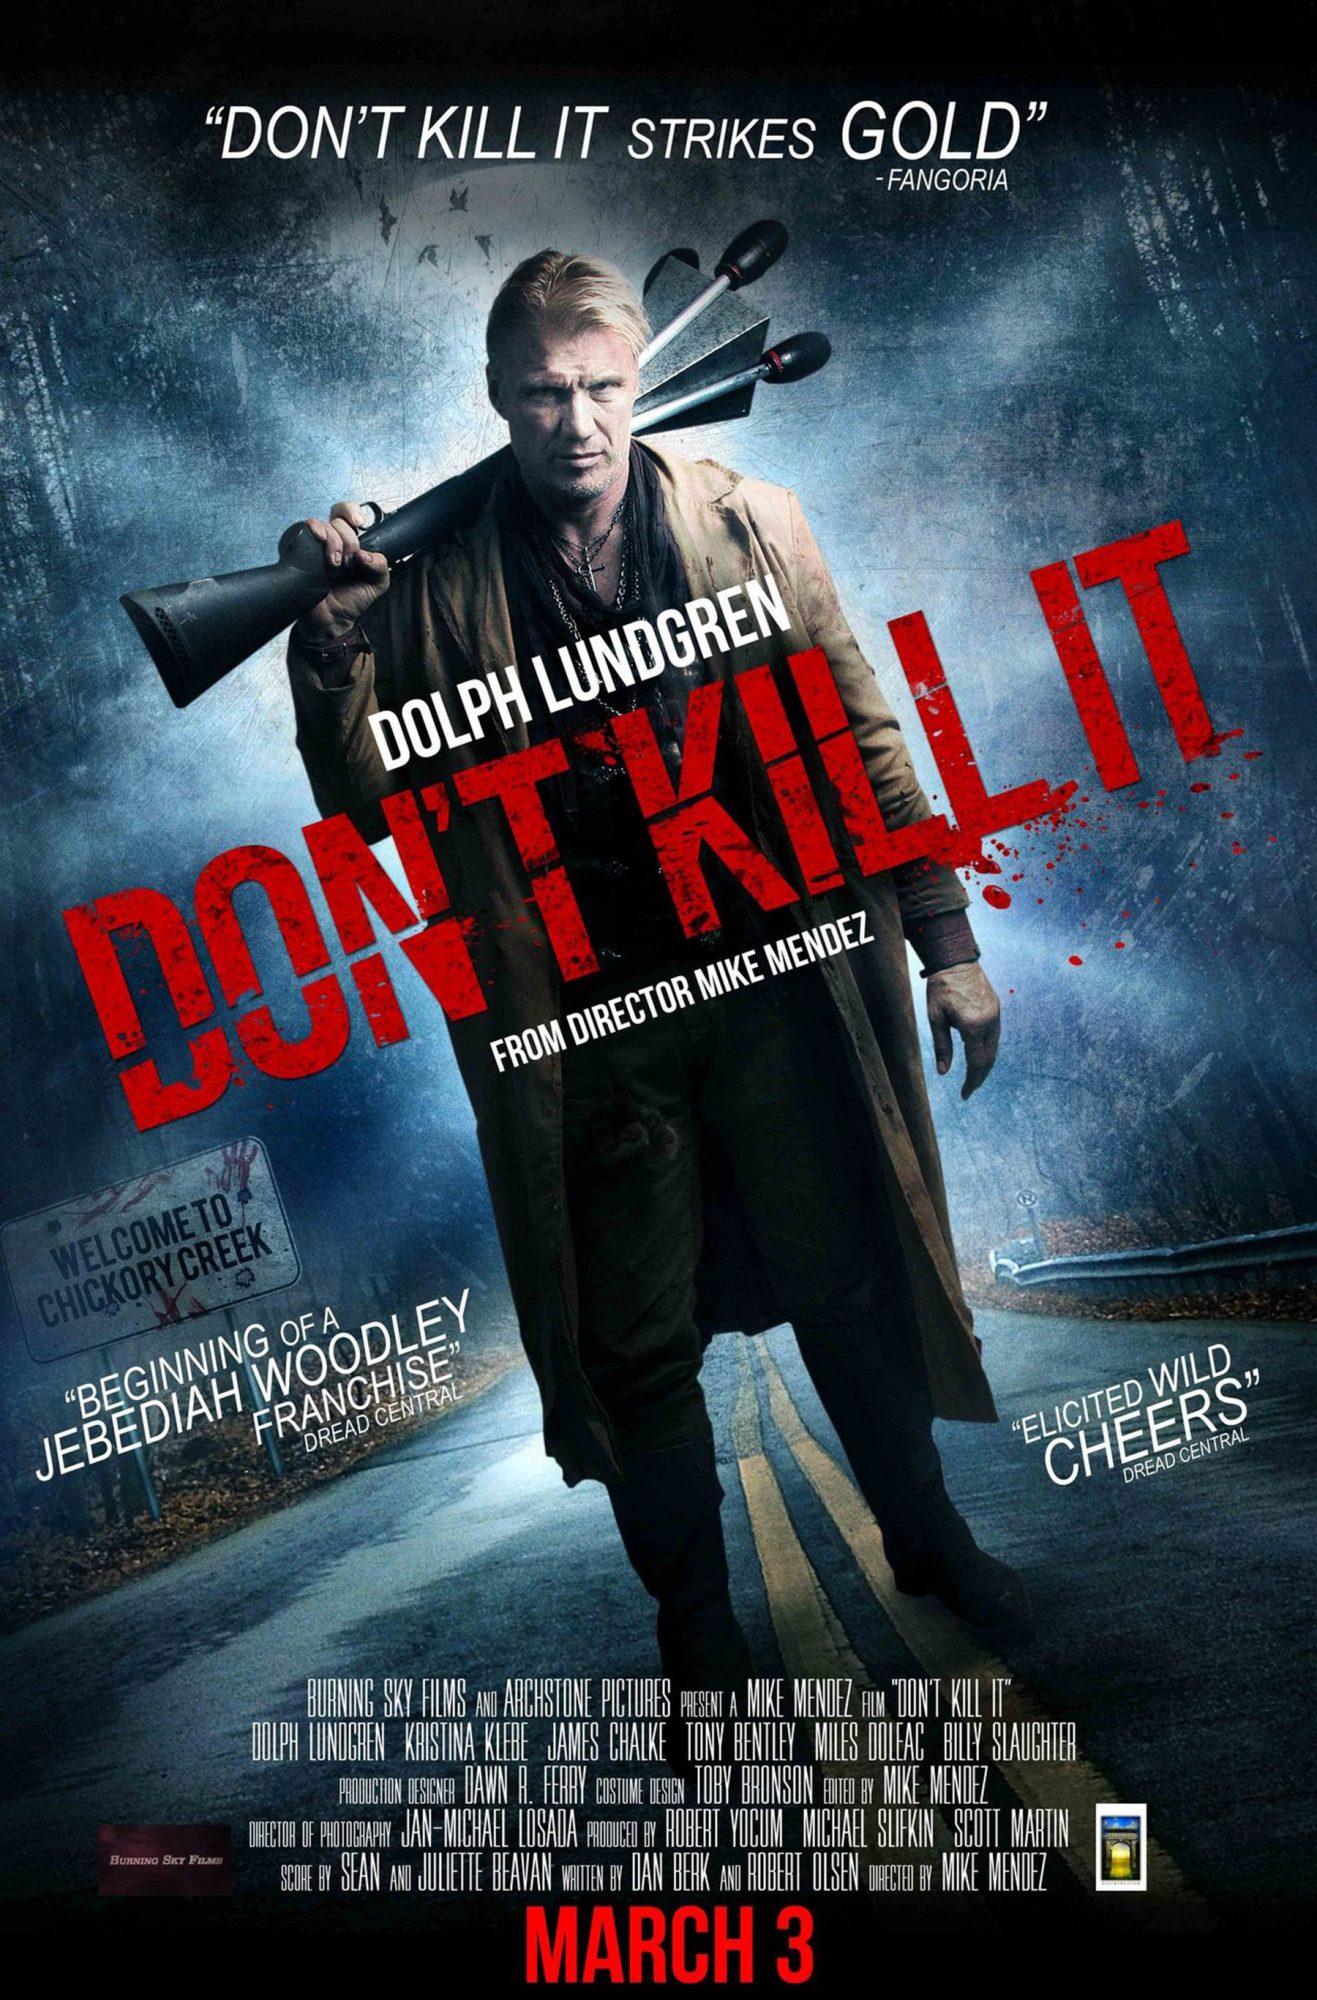 DON'T KILL IT, US poster, Dolph Lundgren, 2016. © Archstone Distribution /Courtesy Everett